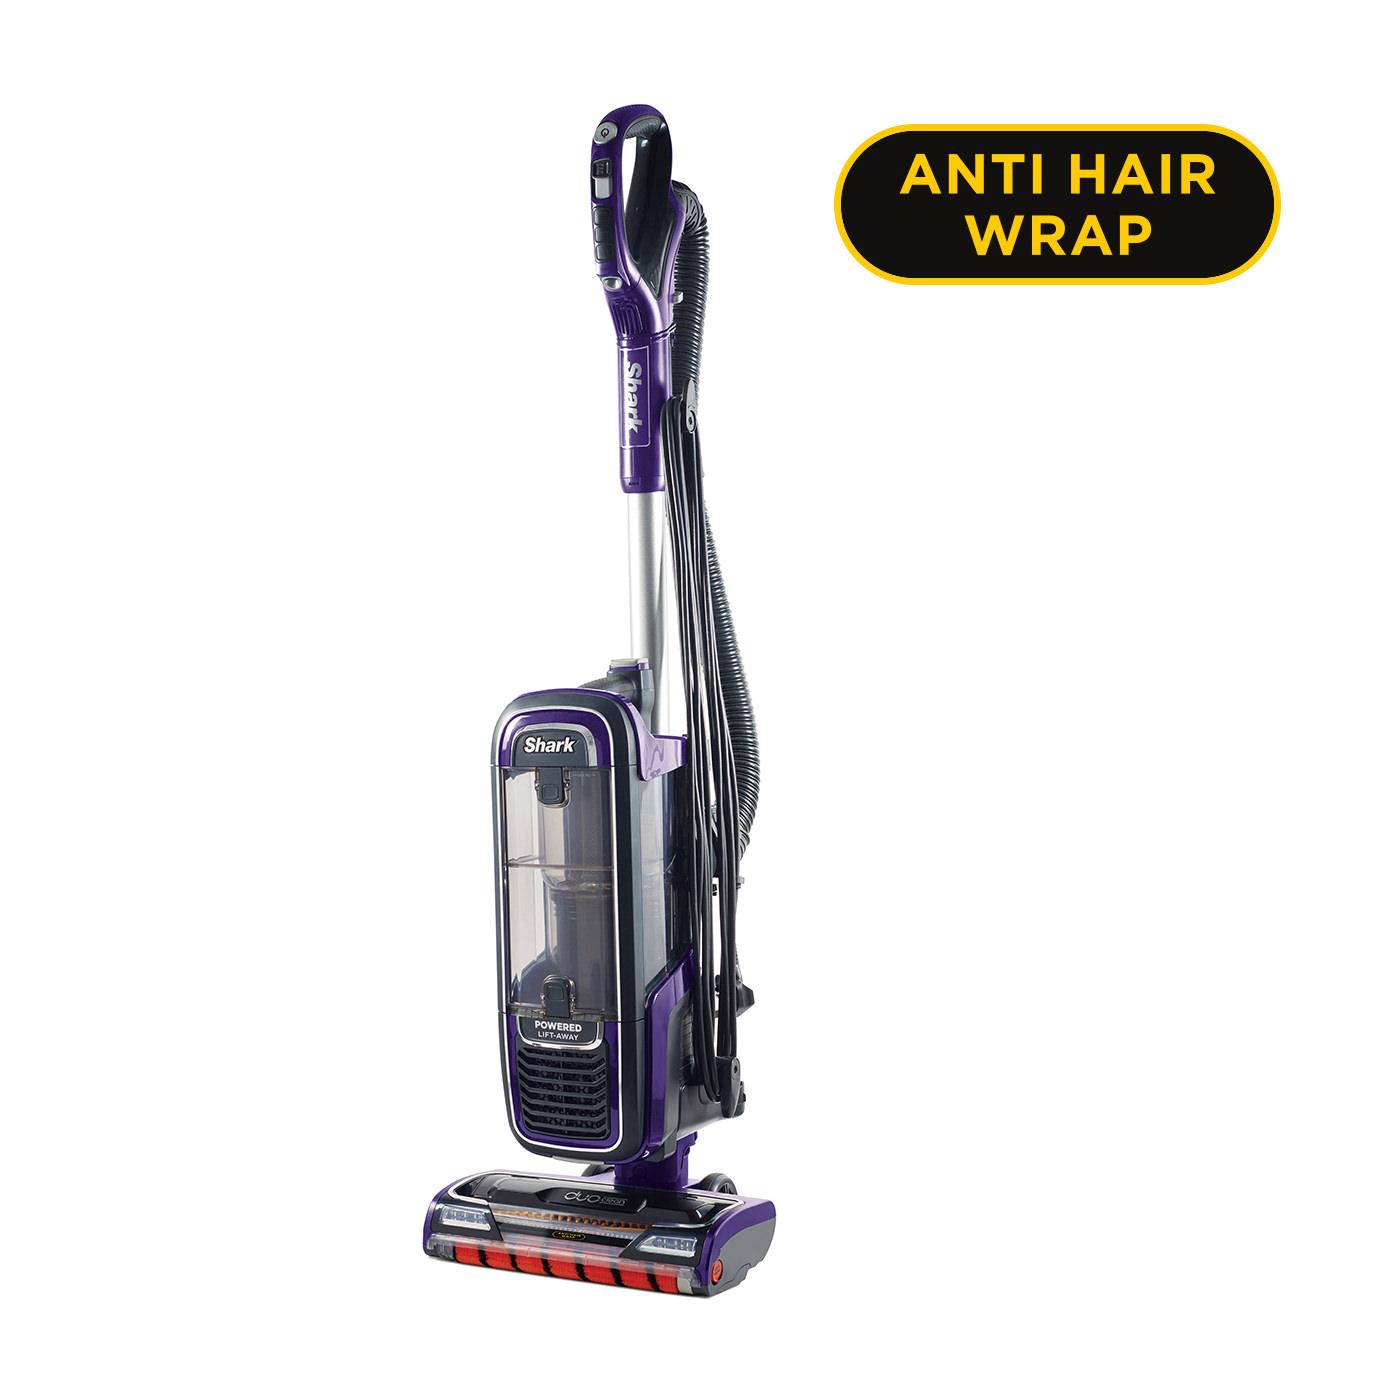 Shark Anti Hair Wrap Upright Vacuum Cleaner Xl With Powered Lift Away Az950uk